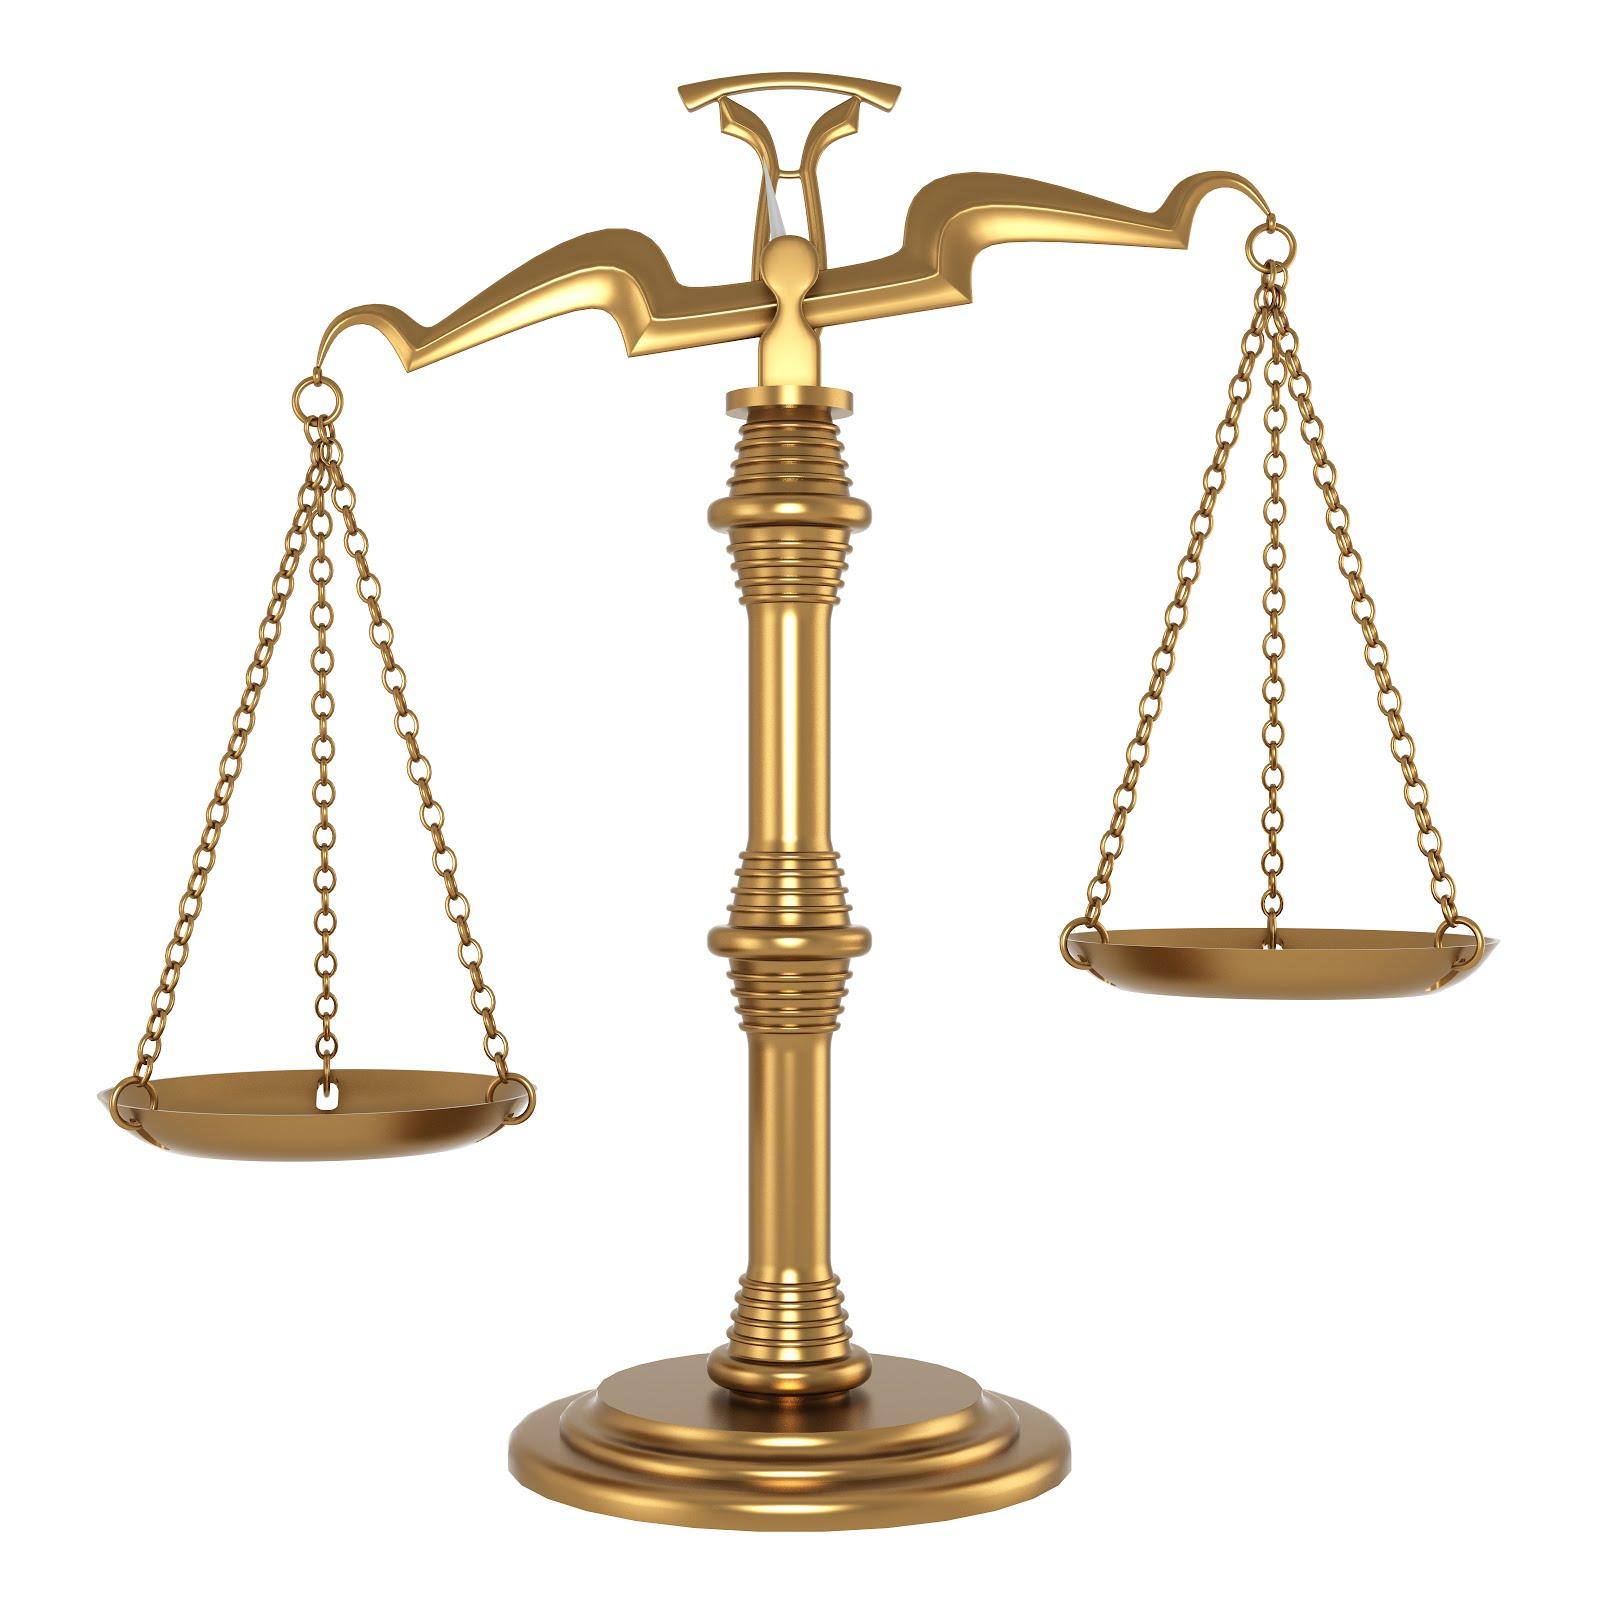 Asesorías Jurídicas